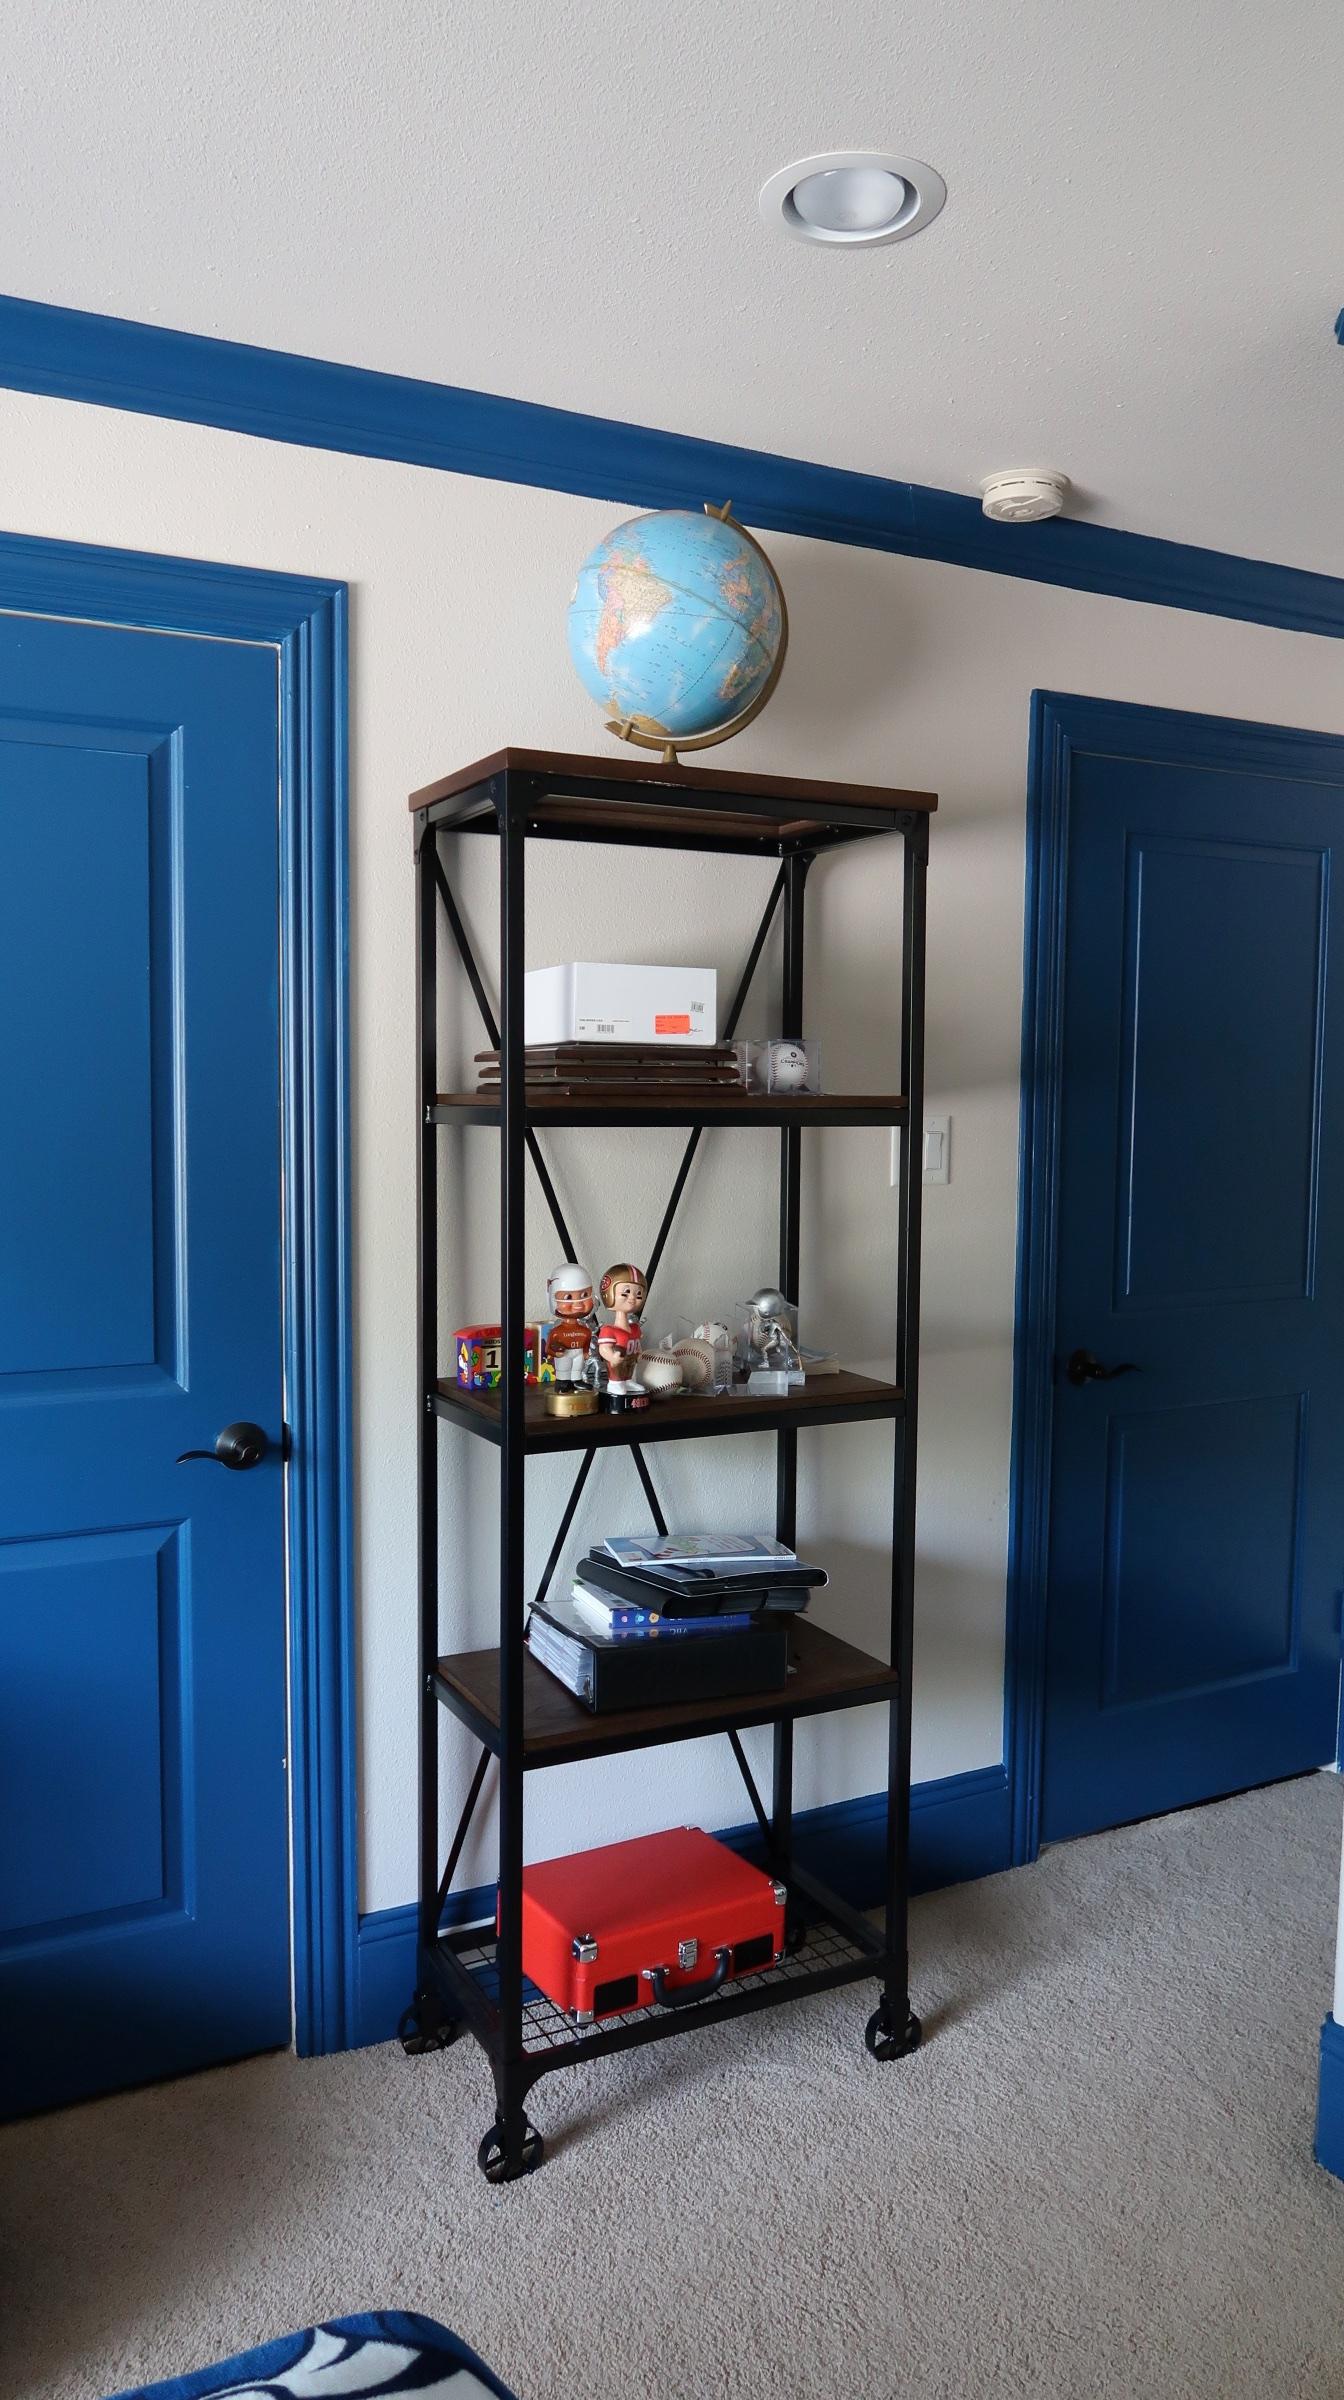 Rustic Modern Bookshelf